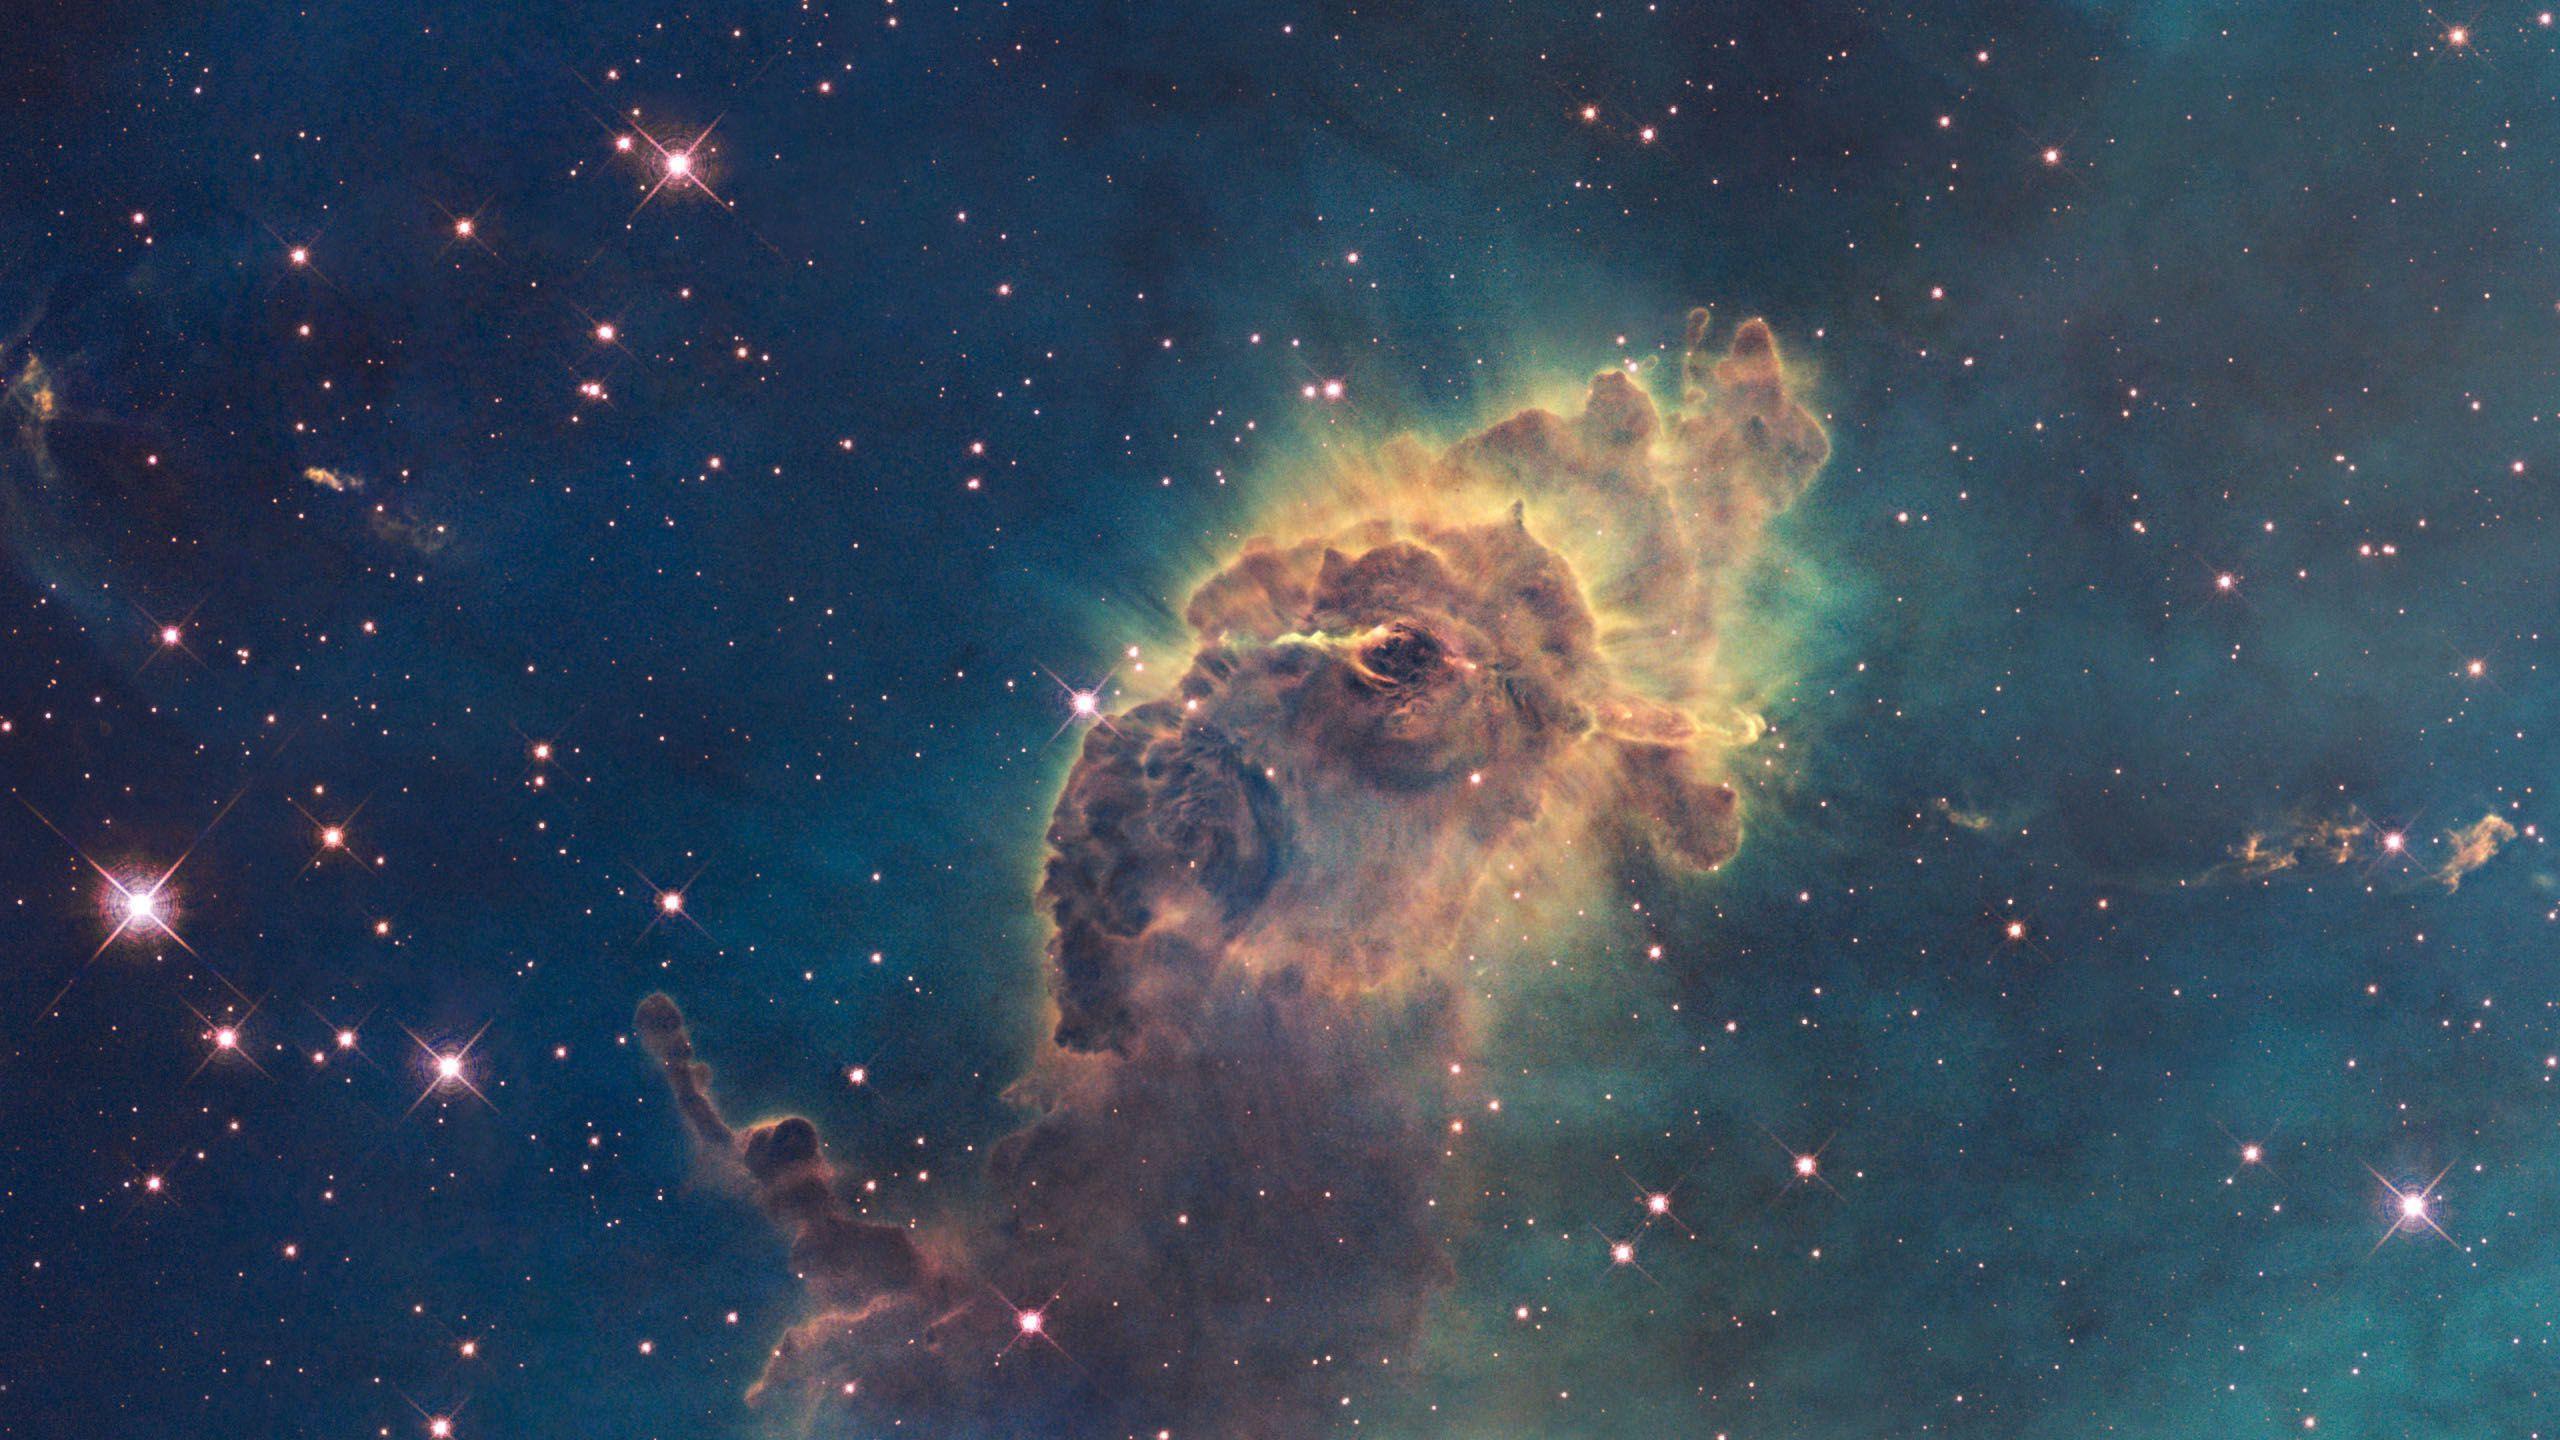 Nebula Wallpapers On Wallpaperdog